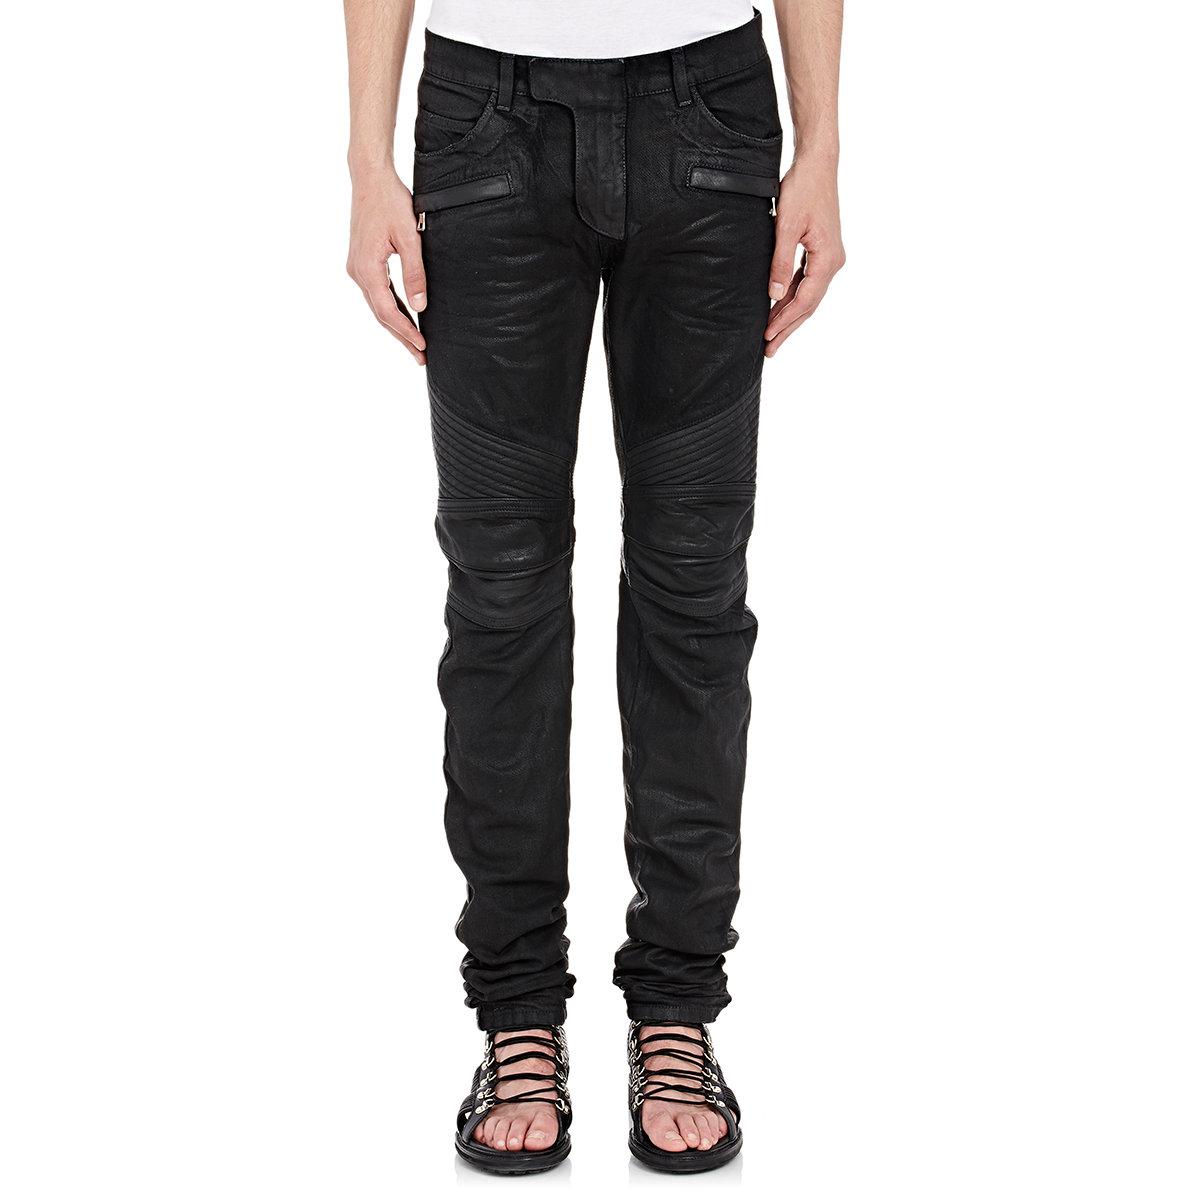 balmain waxed denim moto jeans in black for men lyst. Black Bedroom Furniture Sets. Home Design Ideas